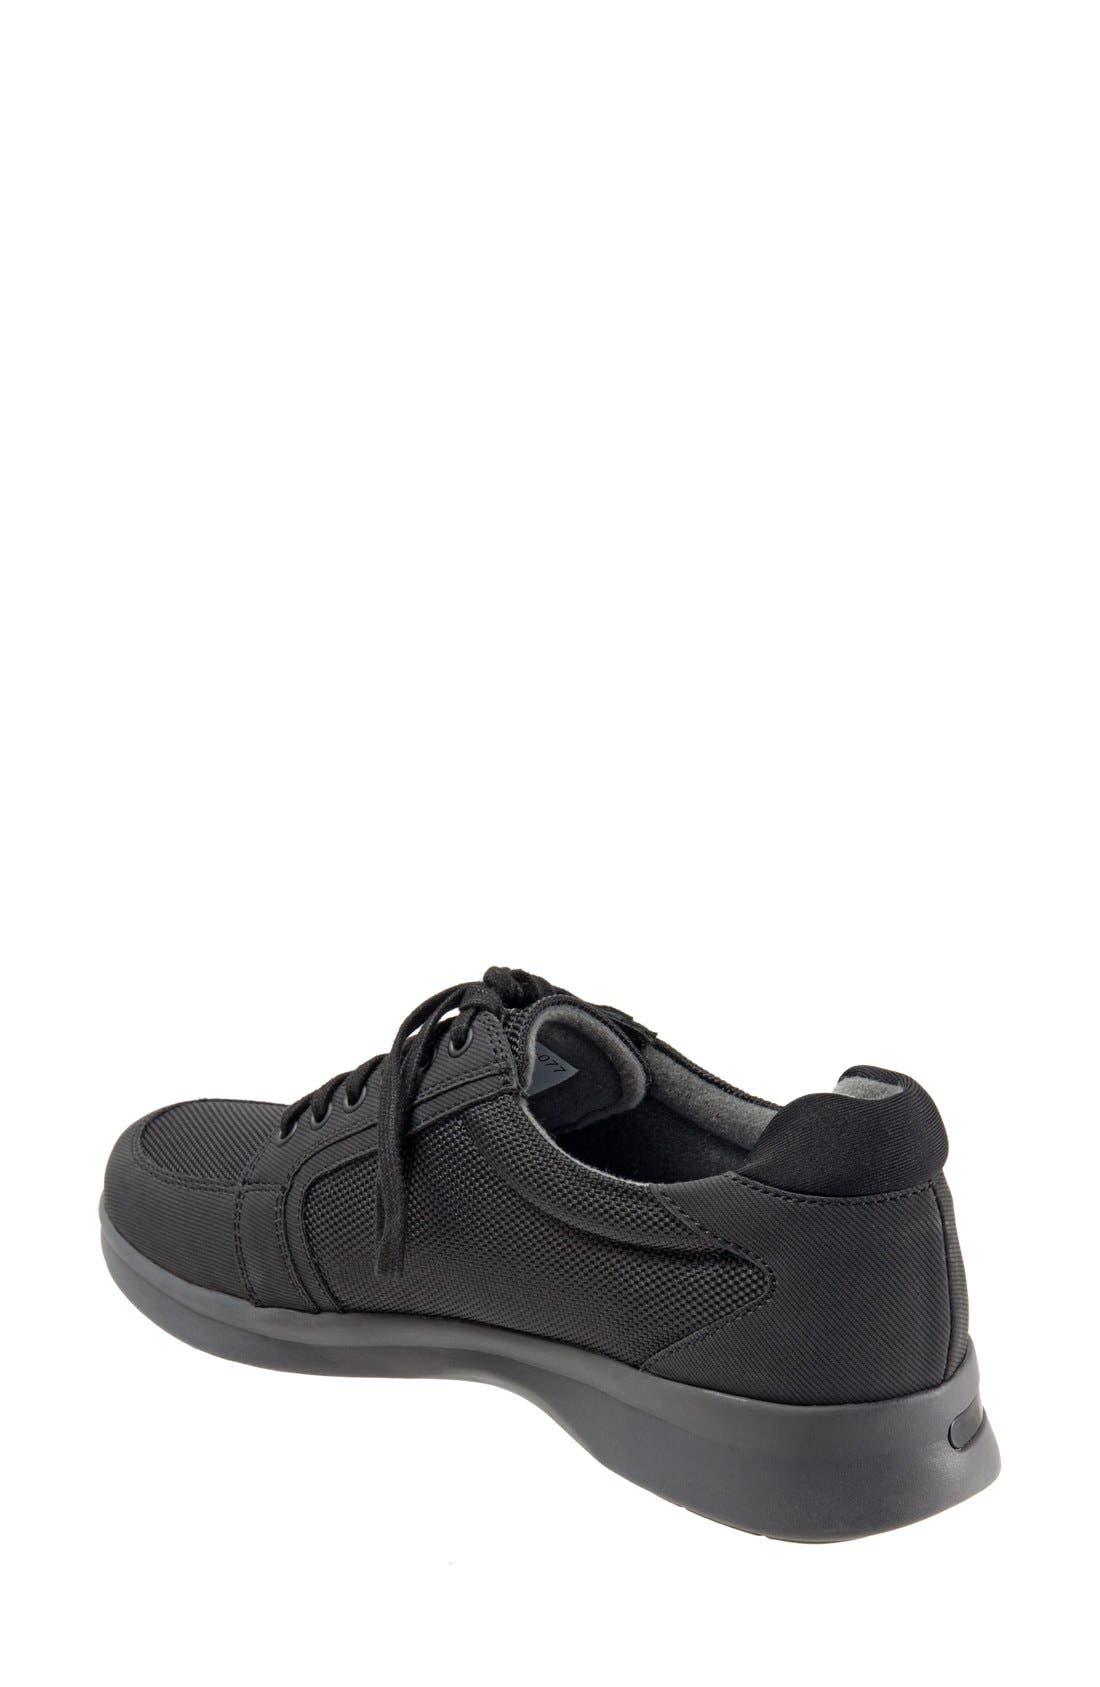 'Vital' Sneaker,                             Alternate thumbnail 2, color,                             BLACK